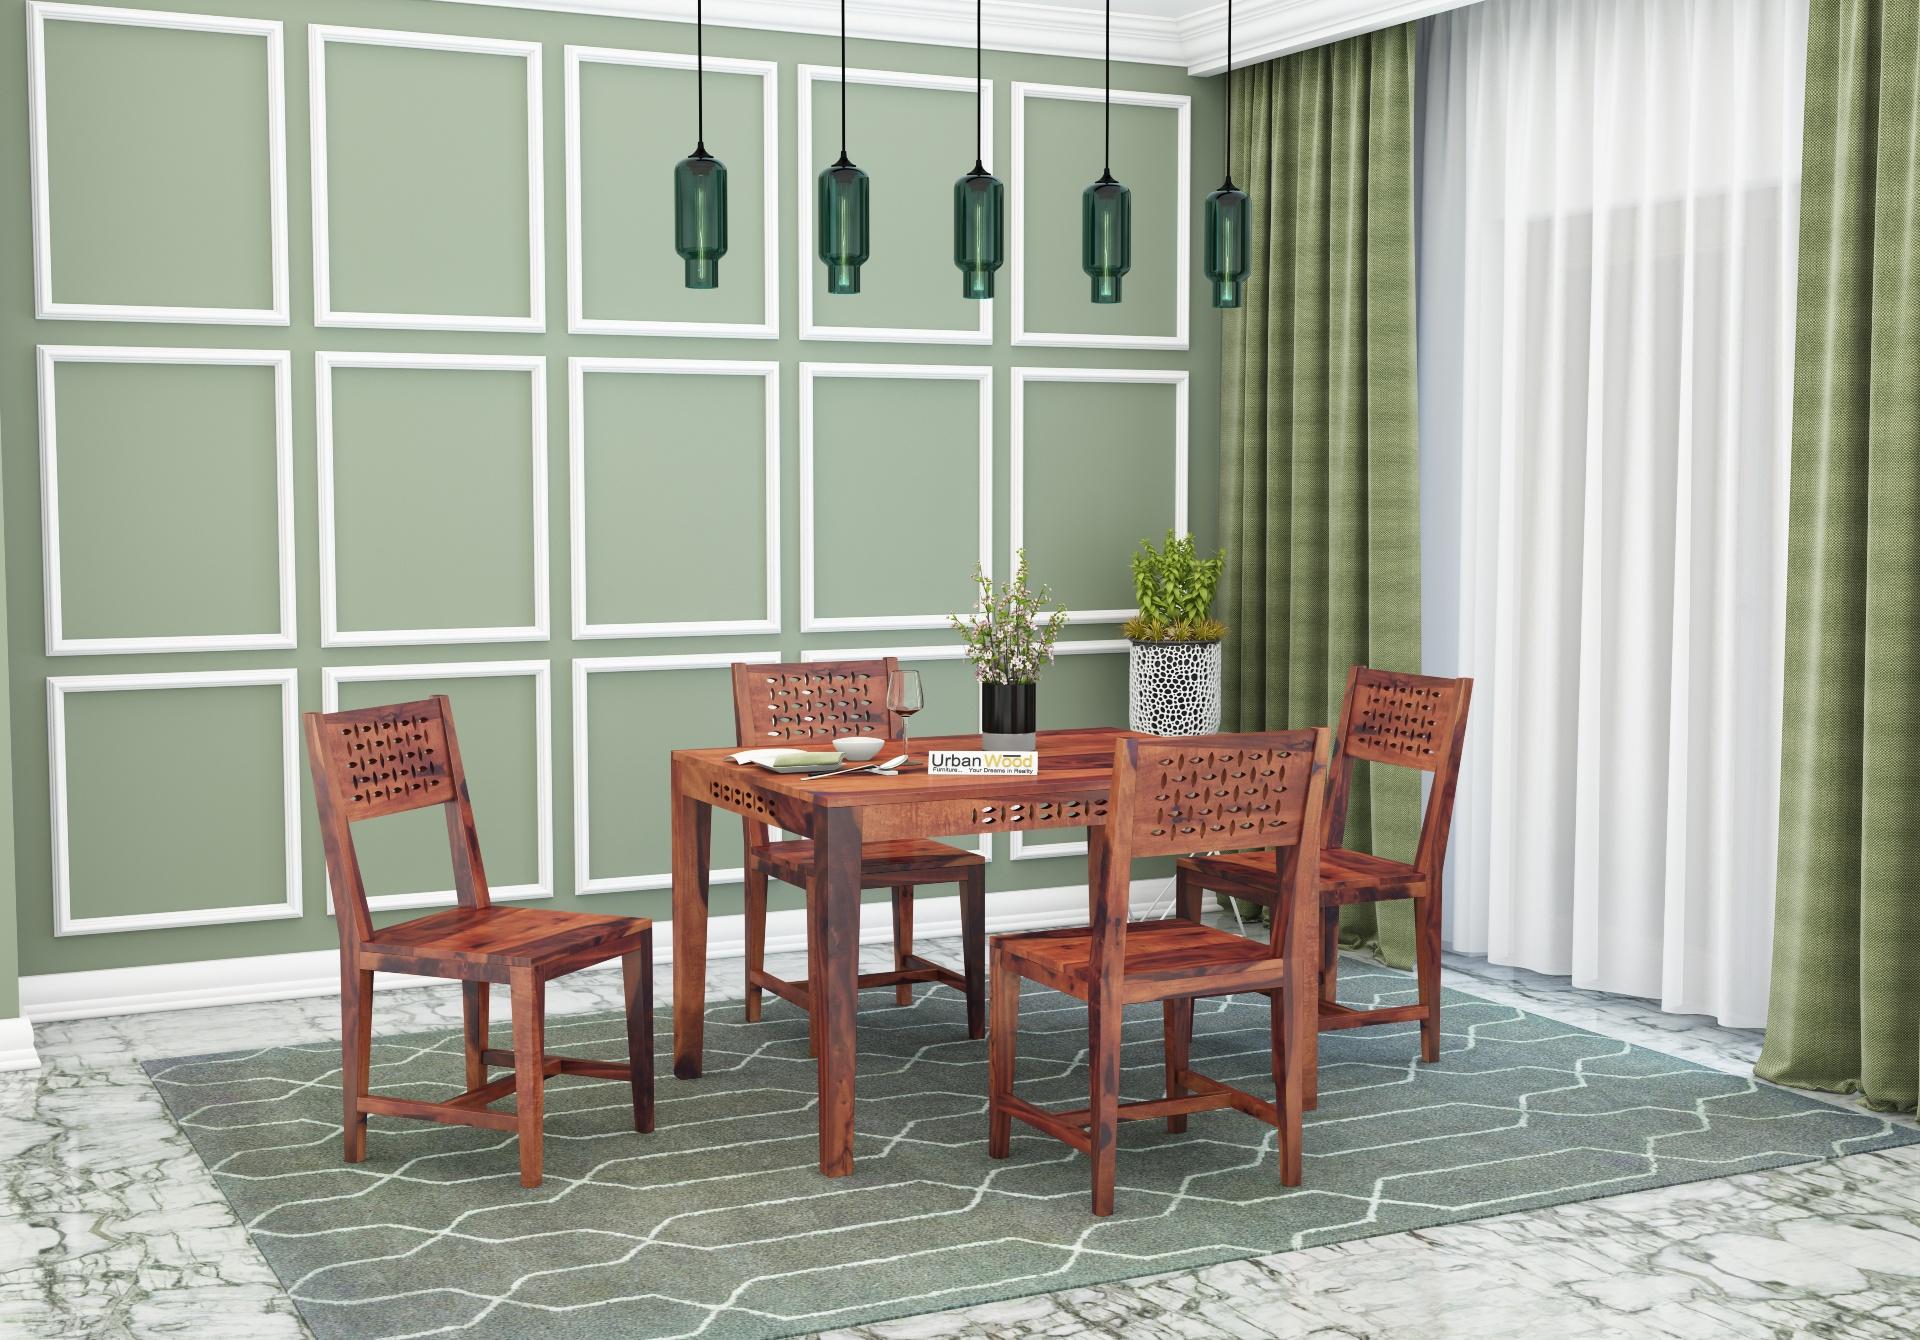 Woodora 4-Seater Dining Set <small>( Teak Finish )</small>